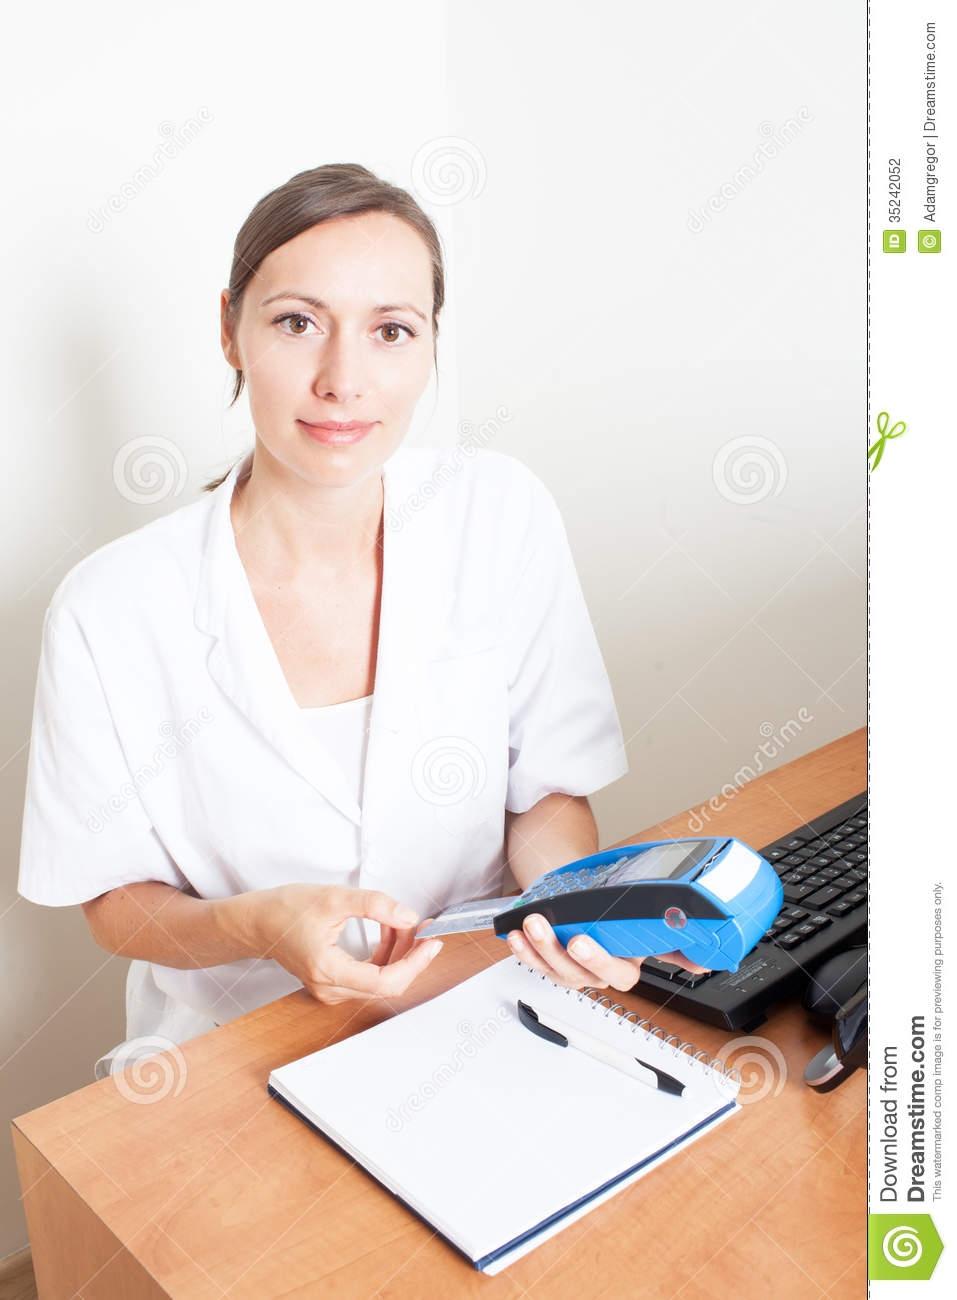 Preparing An Invoice